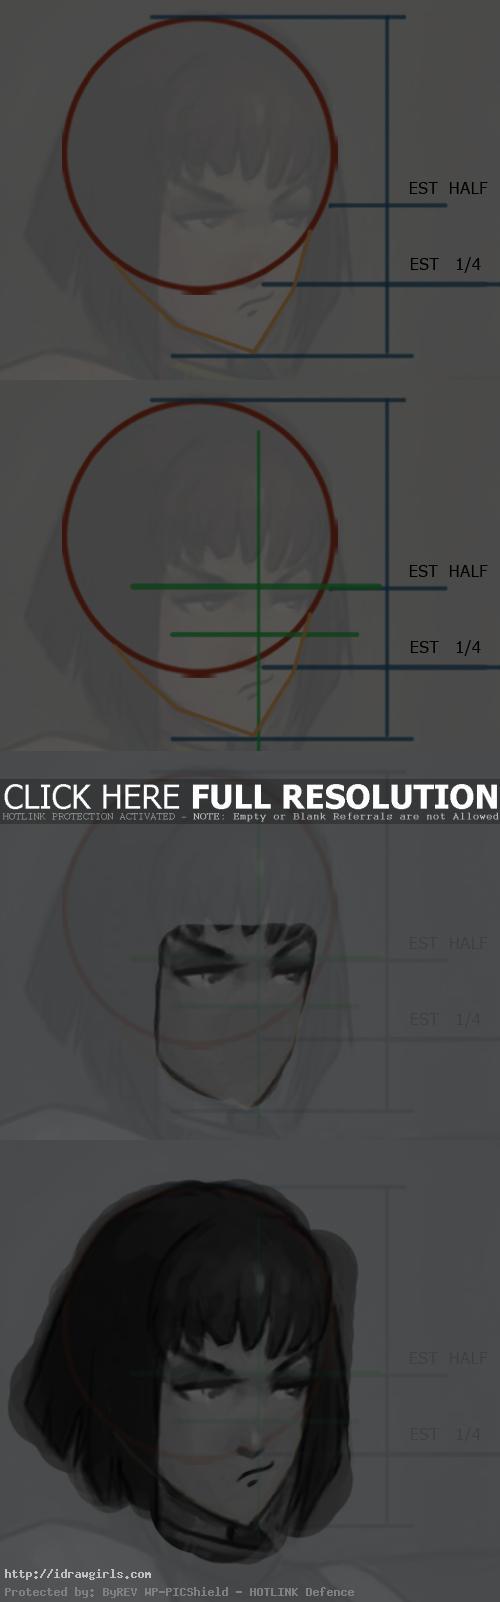 draw Anime grumpy face tutorial